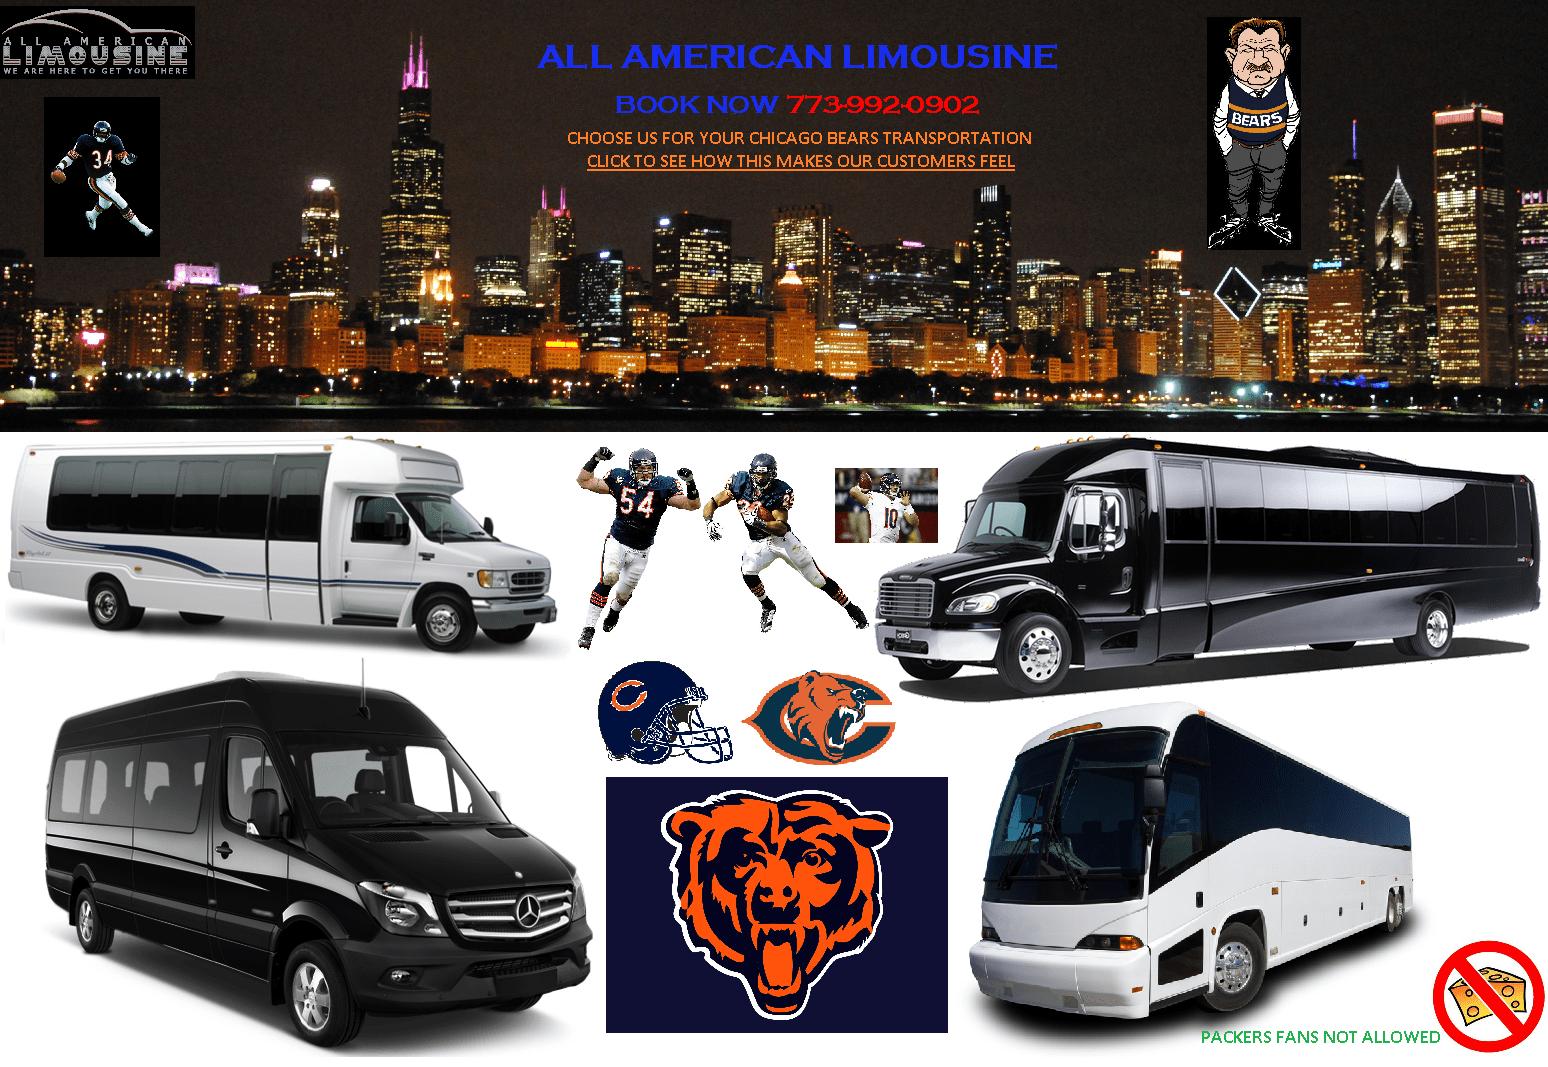 Book Limo Service, Book Car Service, Corporate Sedan, Book Corporate Buses in Chicago